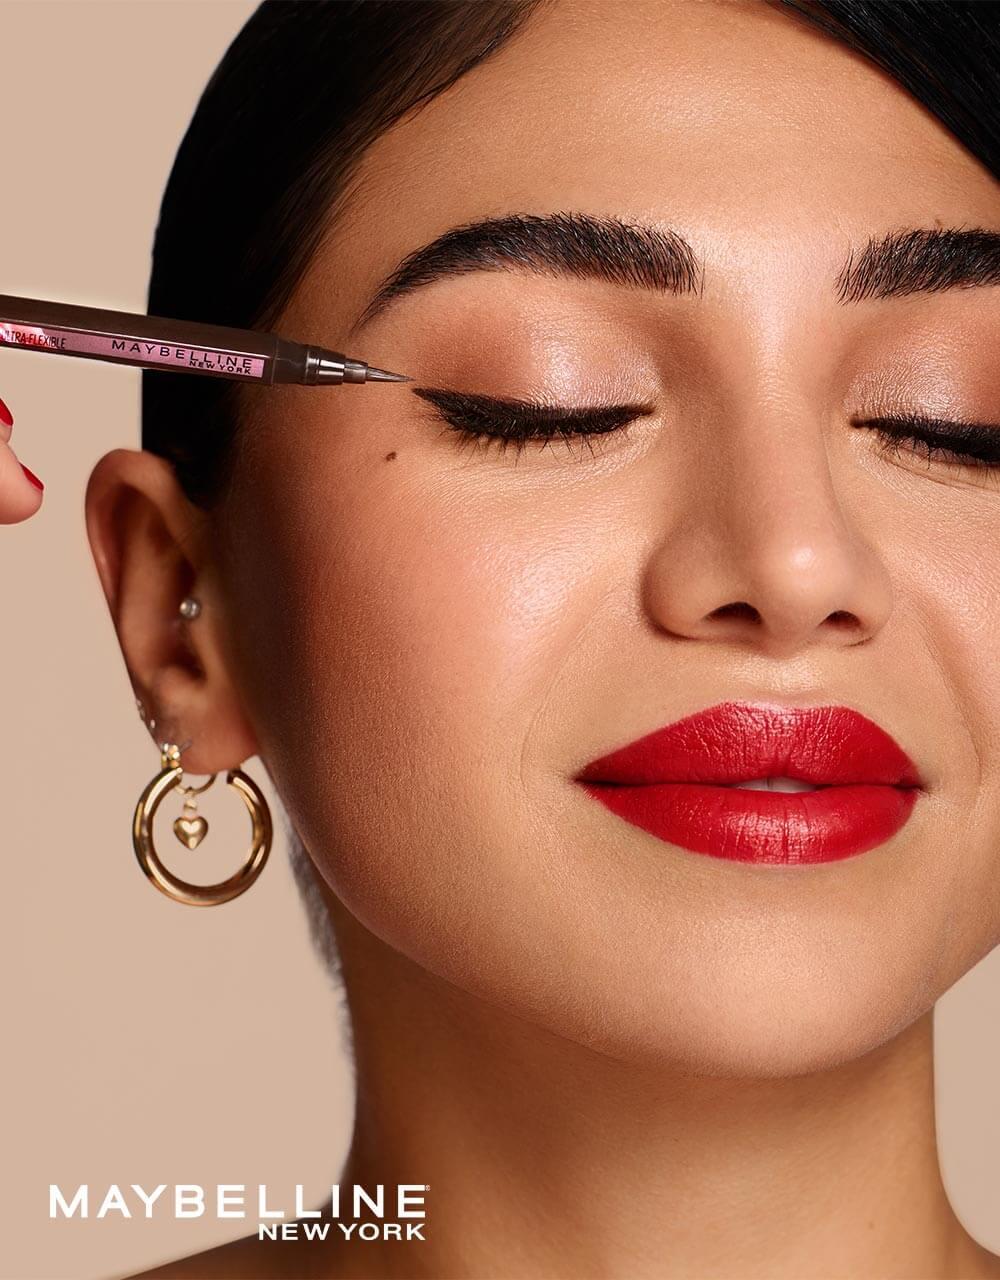 Maybelline Hyper Easy Liquid Liner - Community Beauty Shooting, Foto Mona Strieder